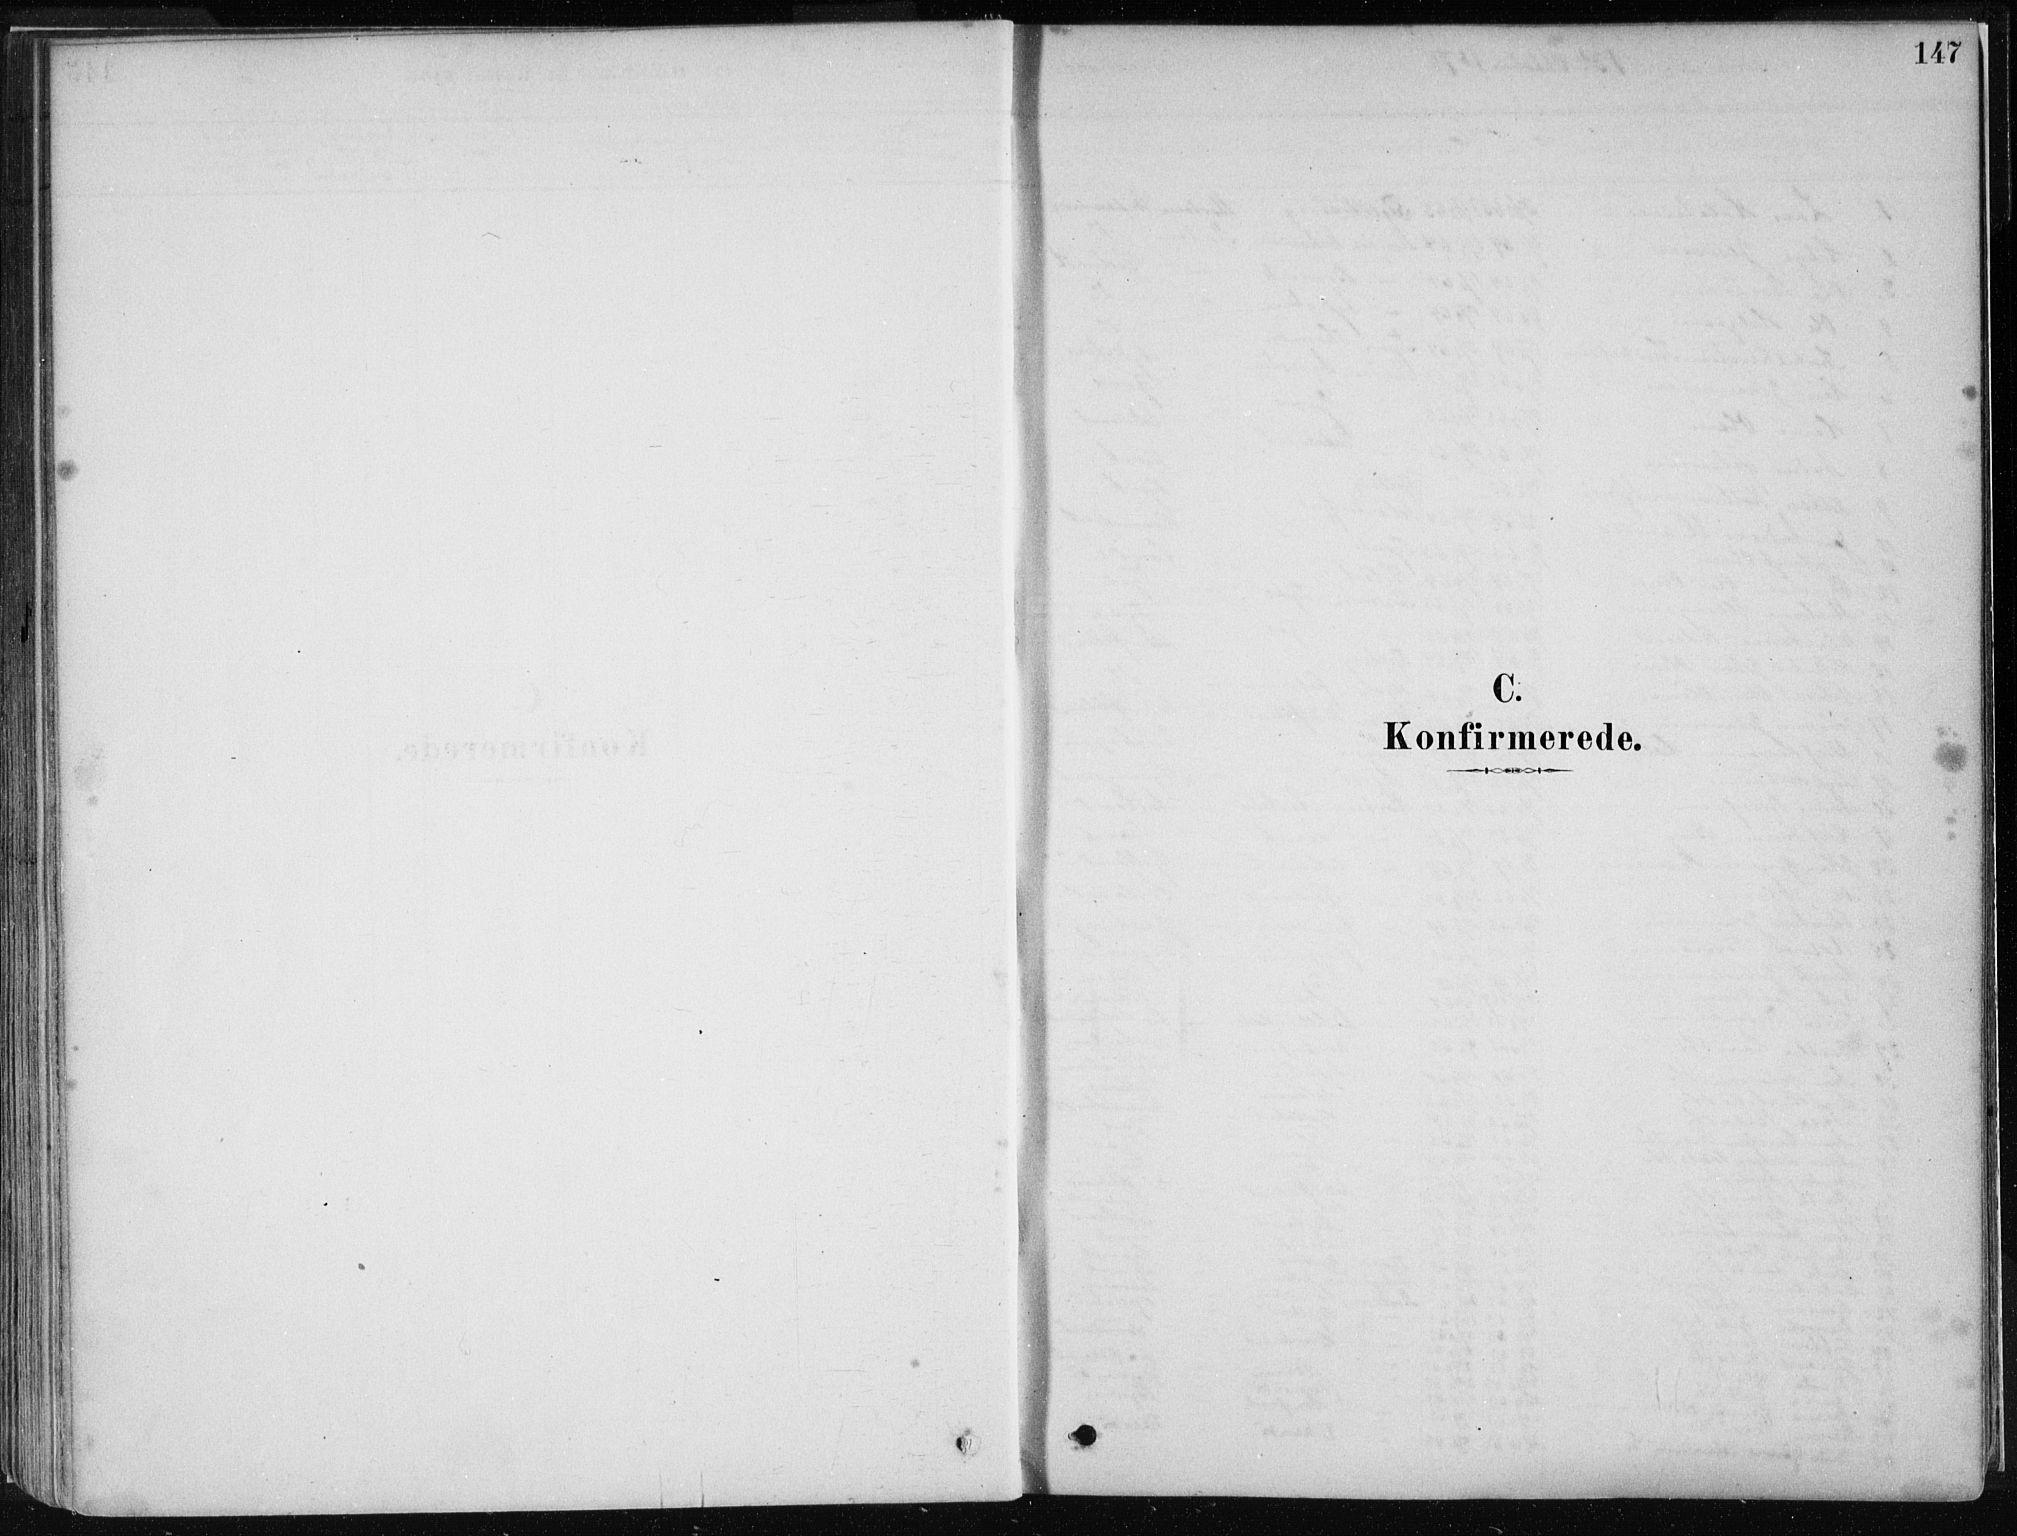 SAB, Stord sokneprestembete, H/Haa: Ministerialbok nr. B 2, 1878-1913, s. 147